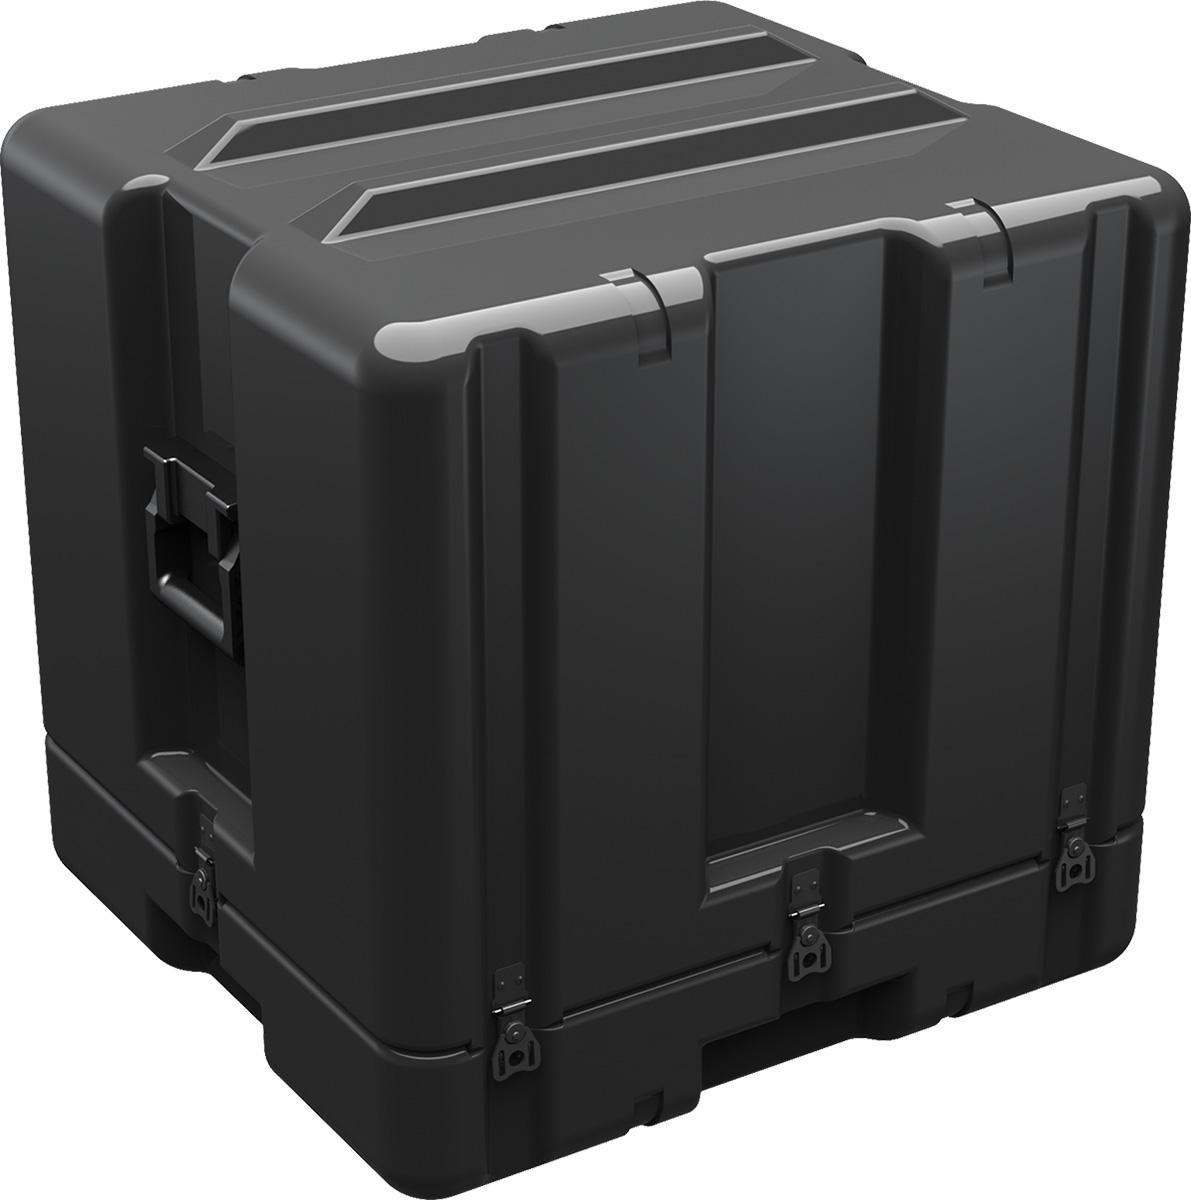 pelican peli products AL2221 0419DE al2221 0419de single lid cas